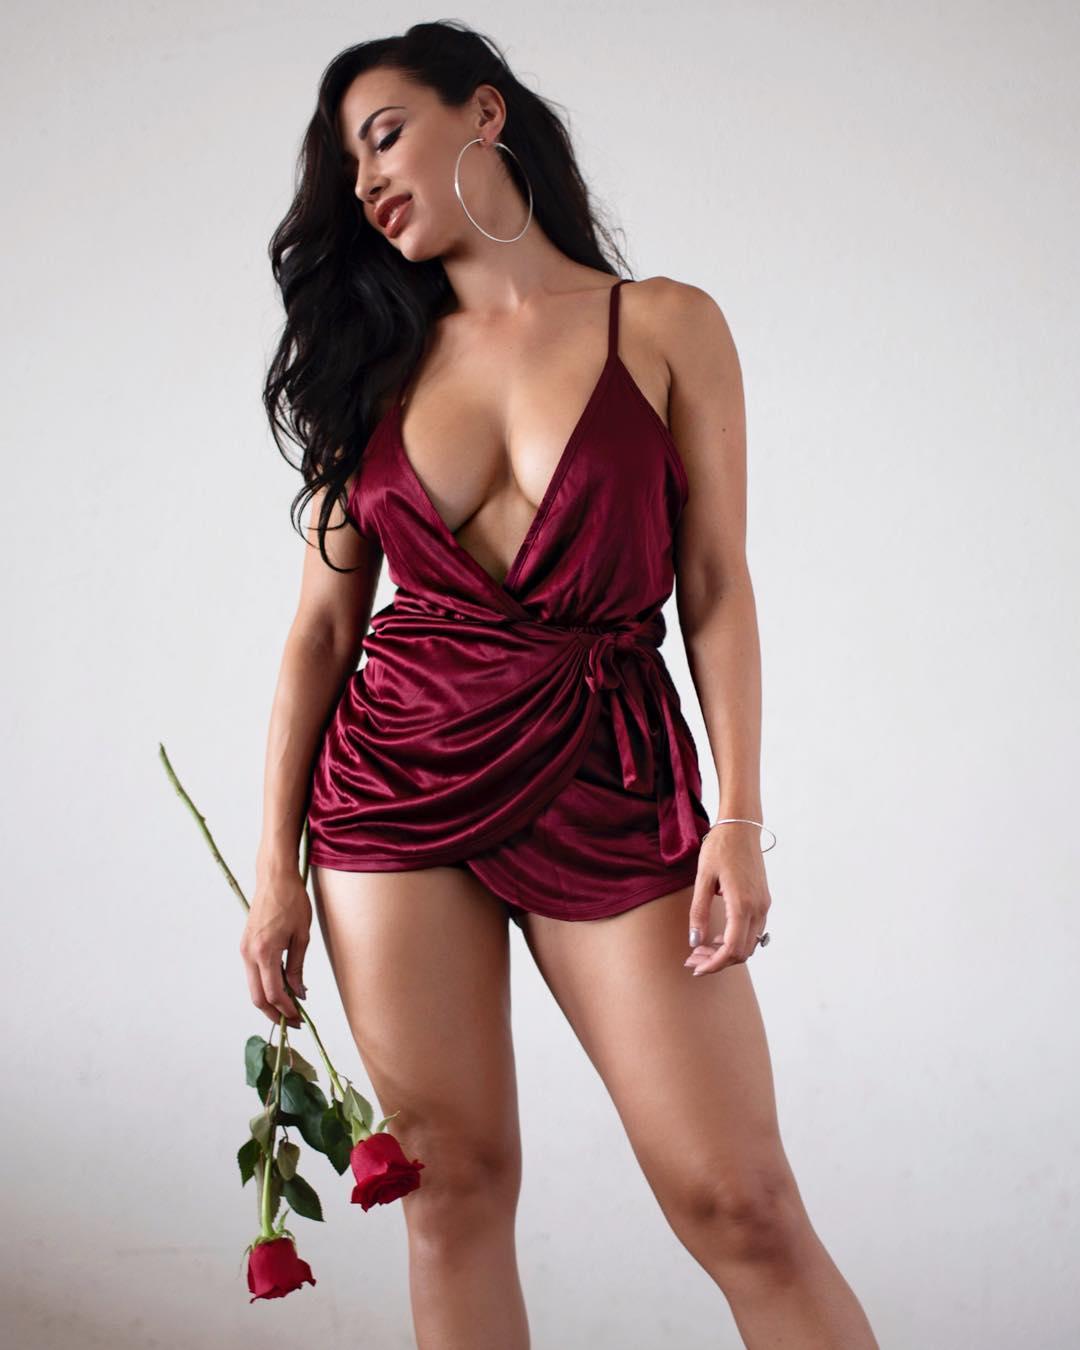 Ana Cheri Garcia Nude Photos 9